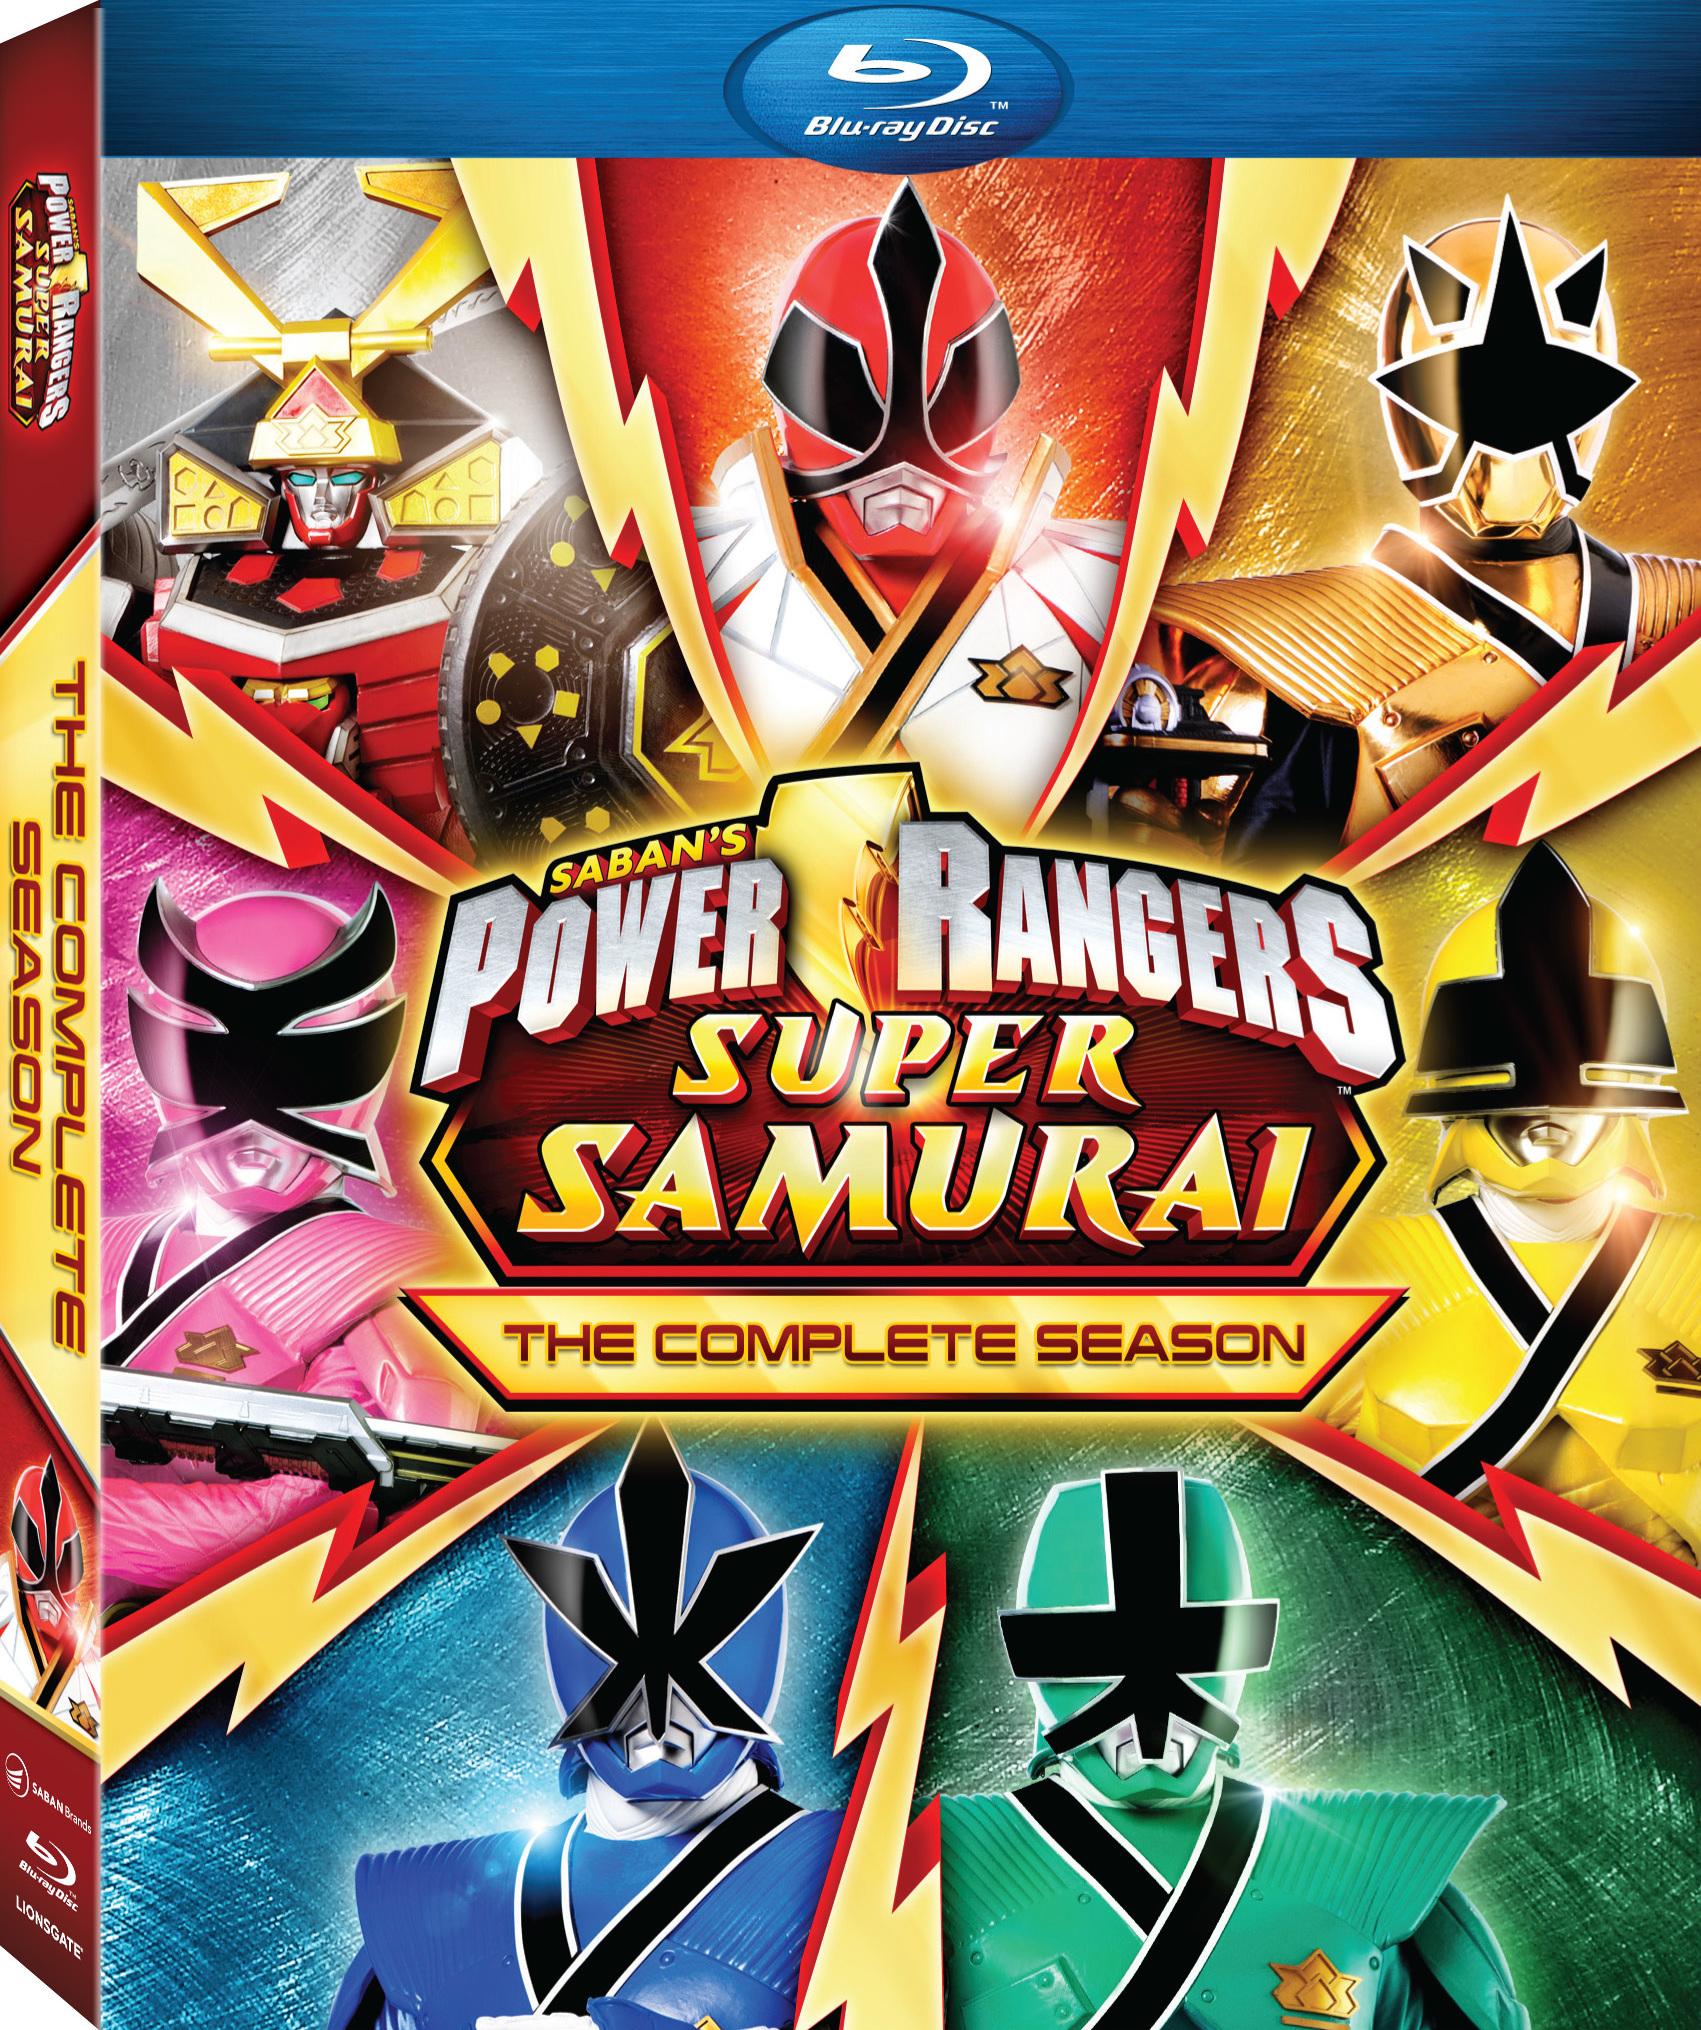 Power Rangers Samurai The Complete Season Blu Ray